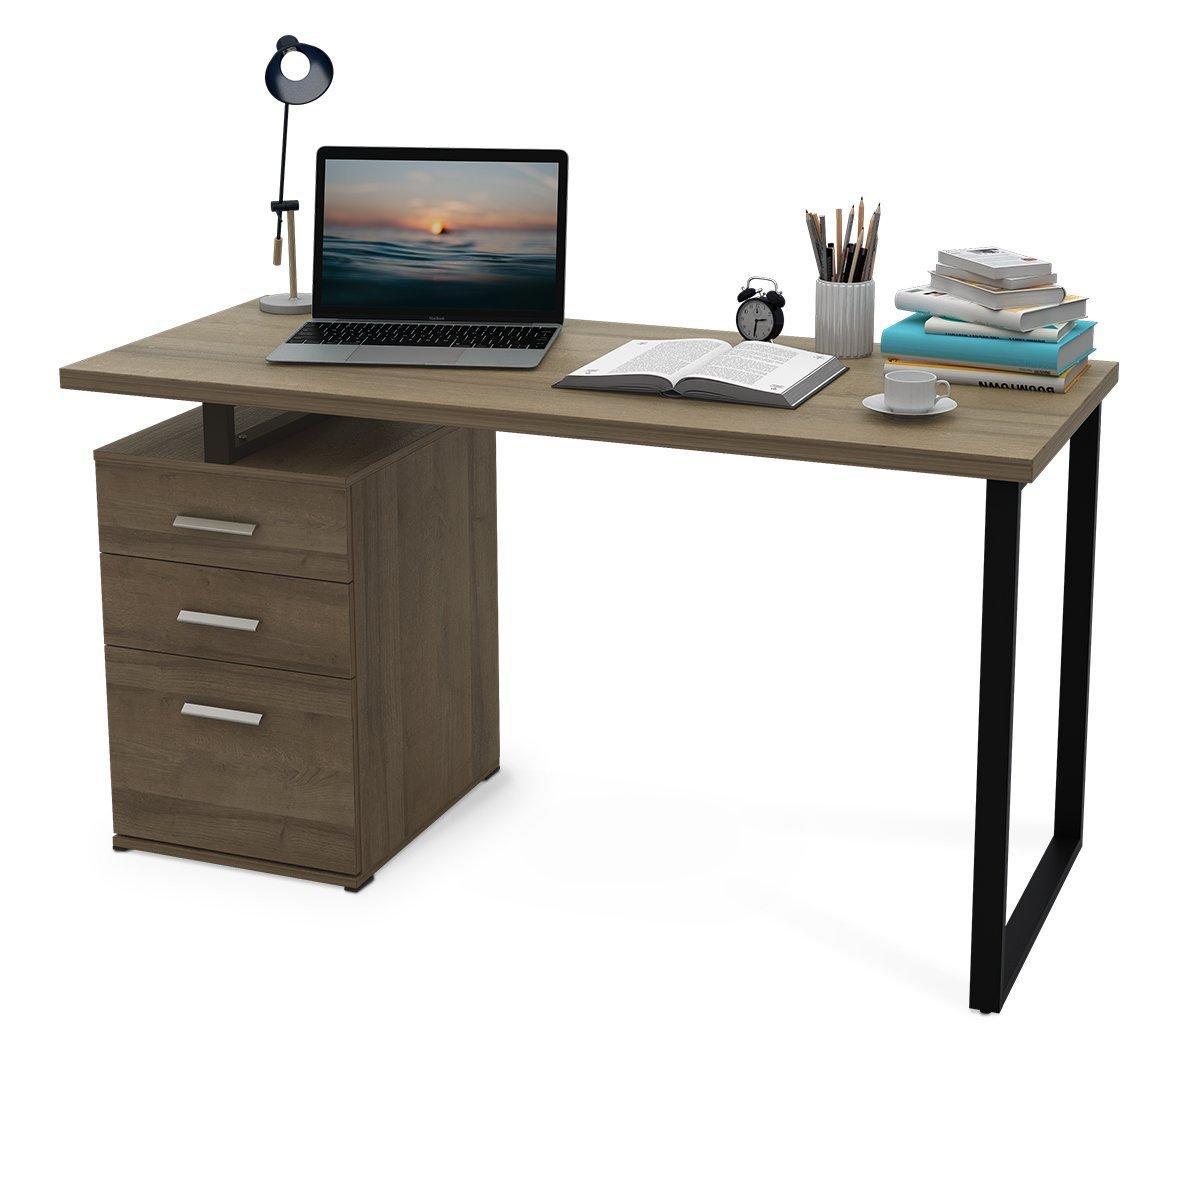 "DEVAISE Modern Computer Desk, 55.1"" Office Desk with Reversible File Cabinet"